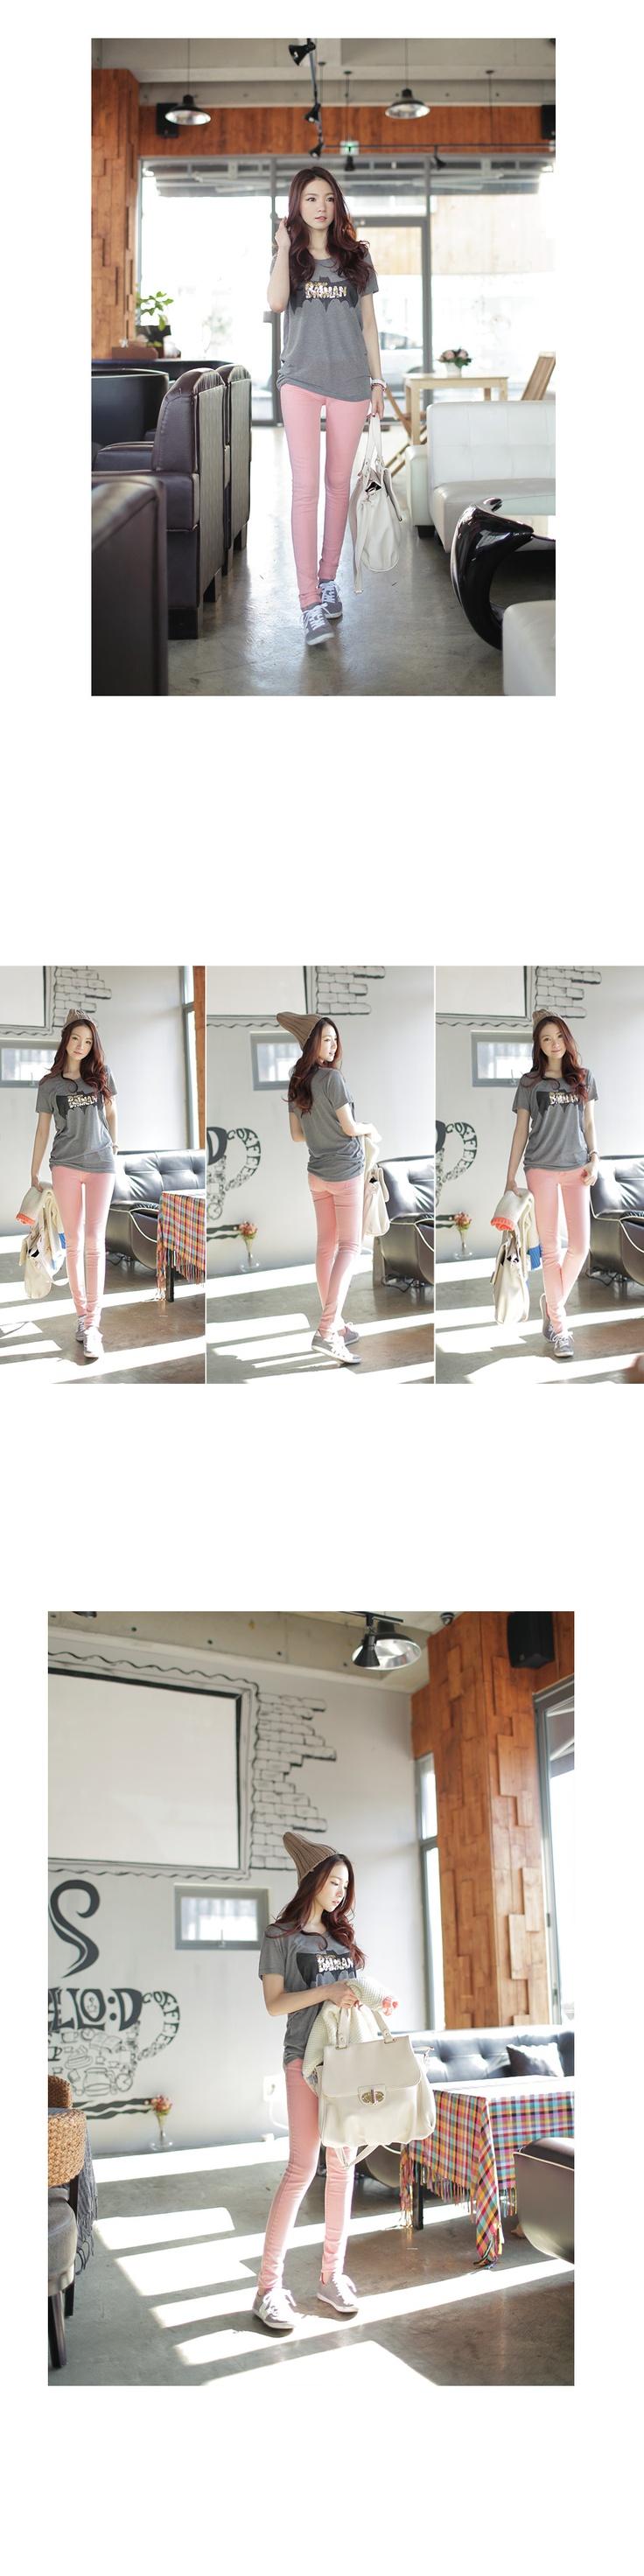 Jual jeans Korea Buy Sell Authentic Korean Skirt Fashion Online Sugarfun Skinny Jeans LFBTM_078_1239 $118 #malaysianbabes #malaysianshopper #malaysiashopper #malaysiashopping #malaysianshopping #onlineshop #onlineshopping #sggirls #koreafashion #koreanfashion #fashion #pikomiko #shoppingspree #spree #poslaju #posmalaysia #malaysiashop